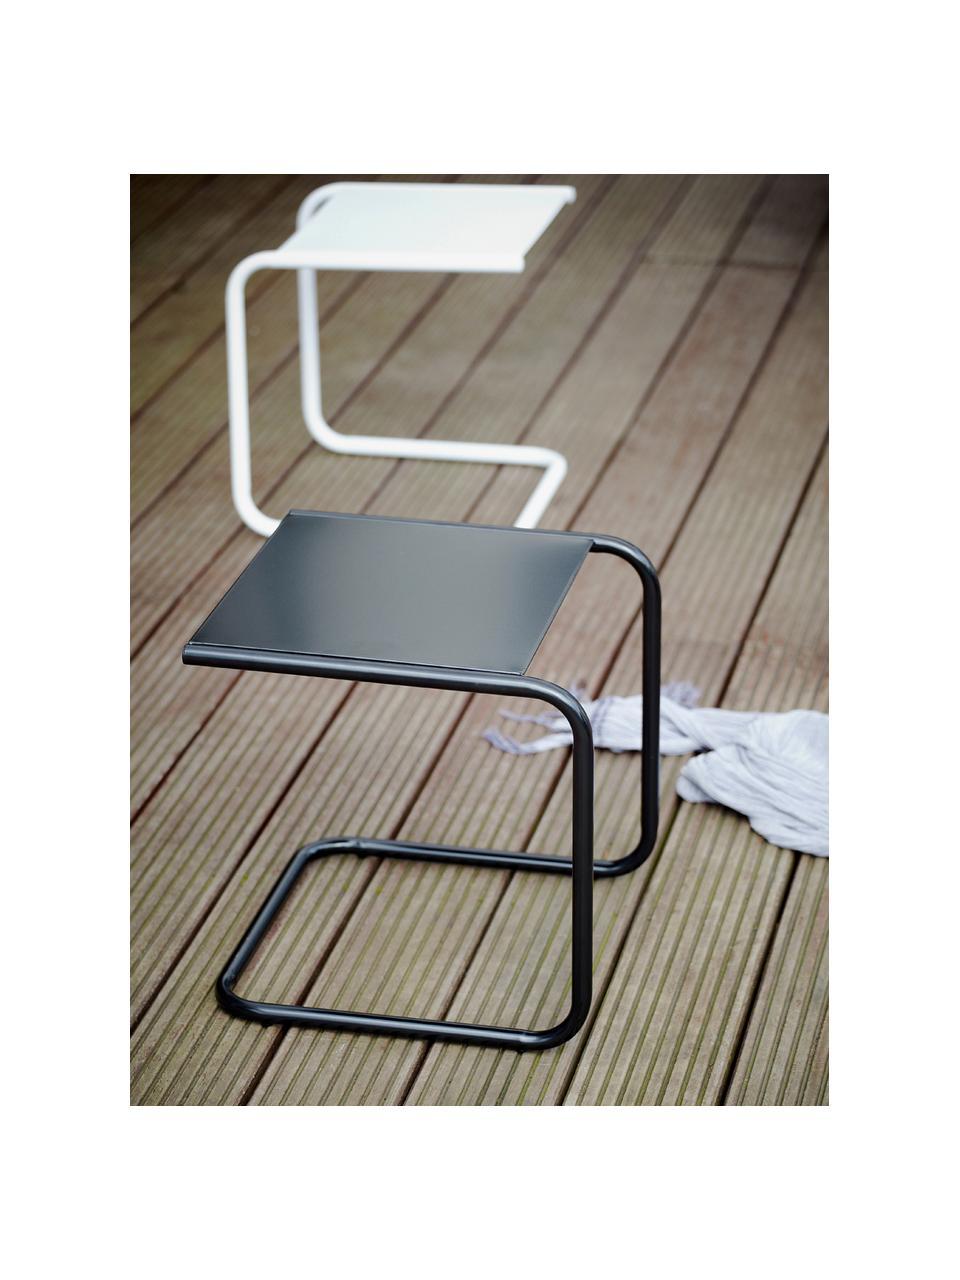 Garten-Beistelltisch Club aus Metall, Tischplatte: Metall, pulverbeschichtet, Gestell: Aluminium, pulverbeschich, Weiß, B 40 x T 40 cm